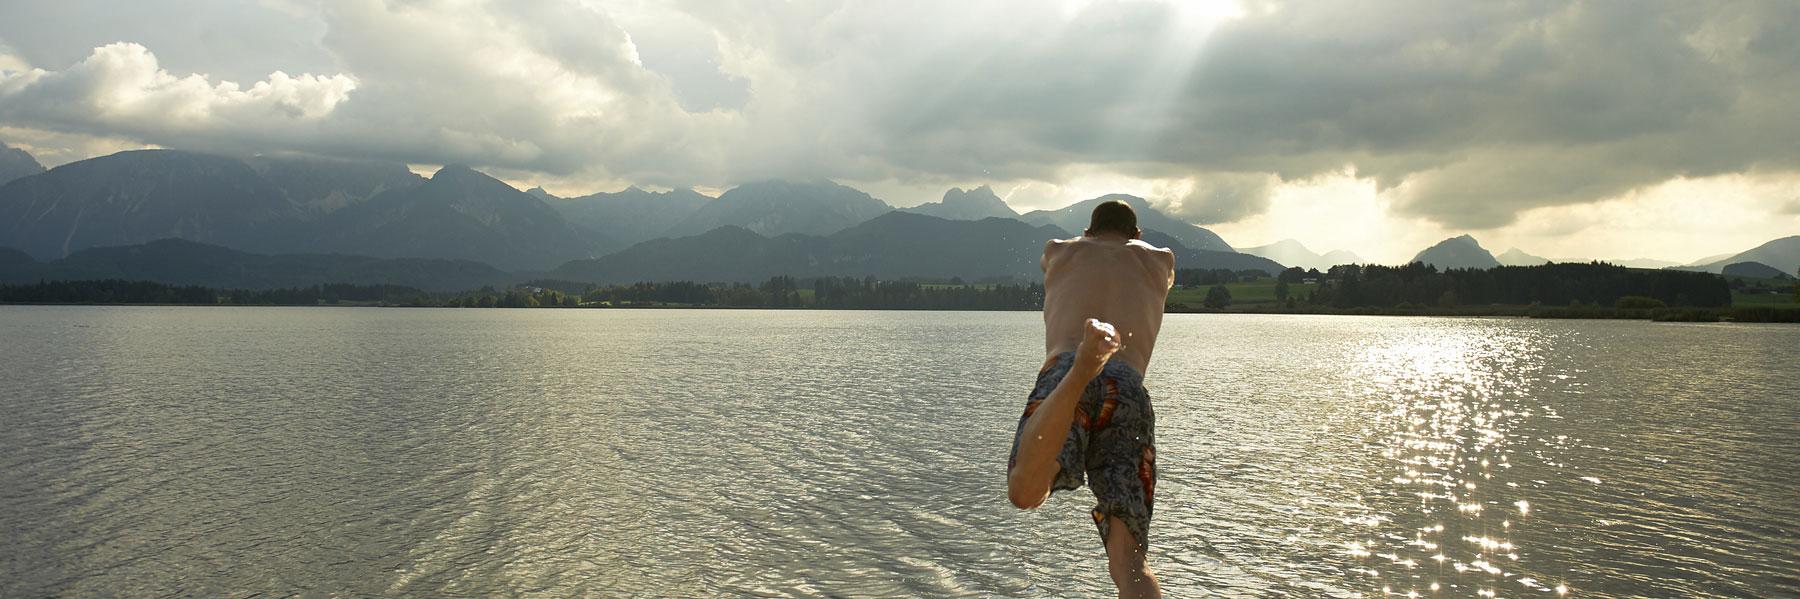 Badeurlaub im Allgäu